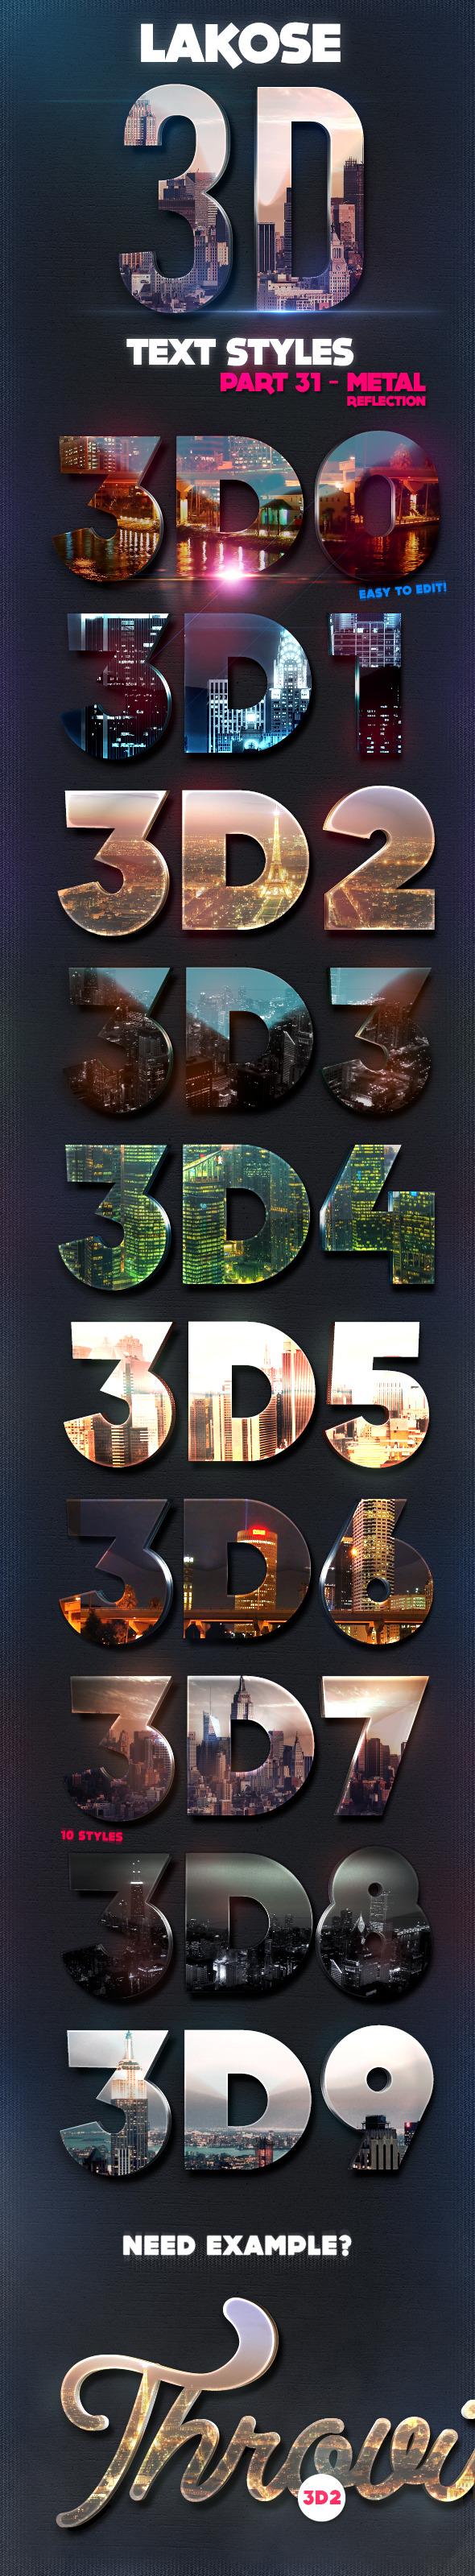 Lakose 3D Text Styles Part 31 - Text Effects Styles